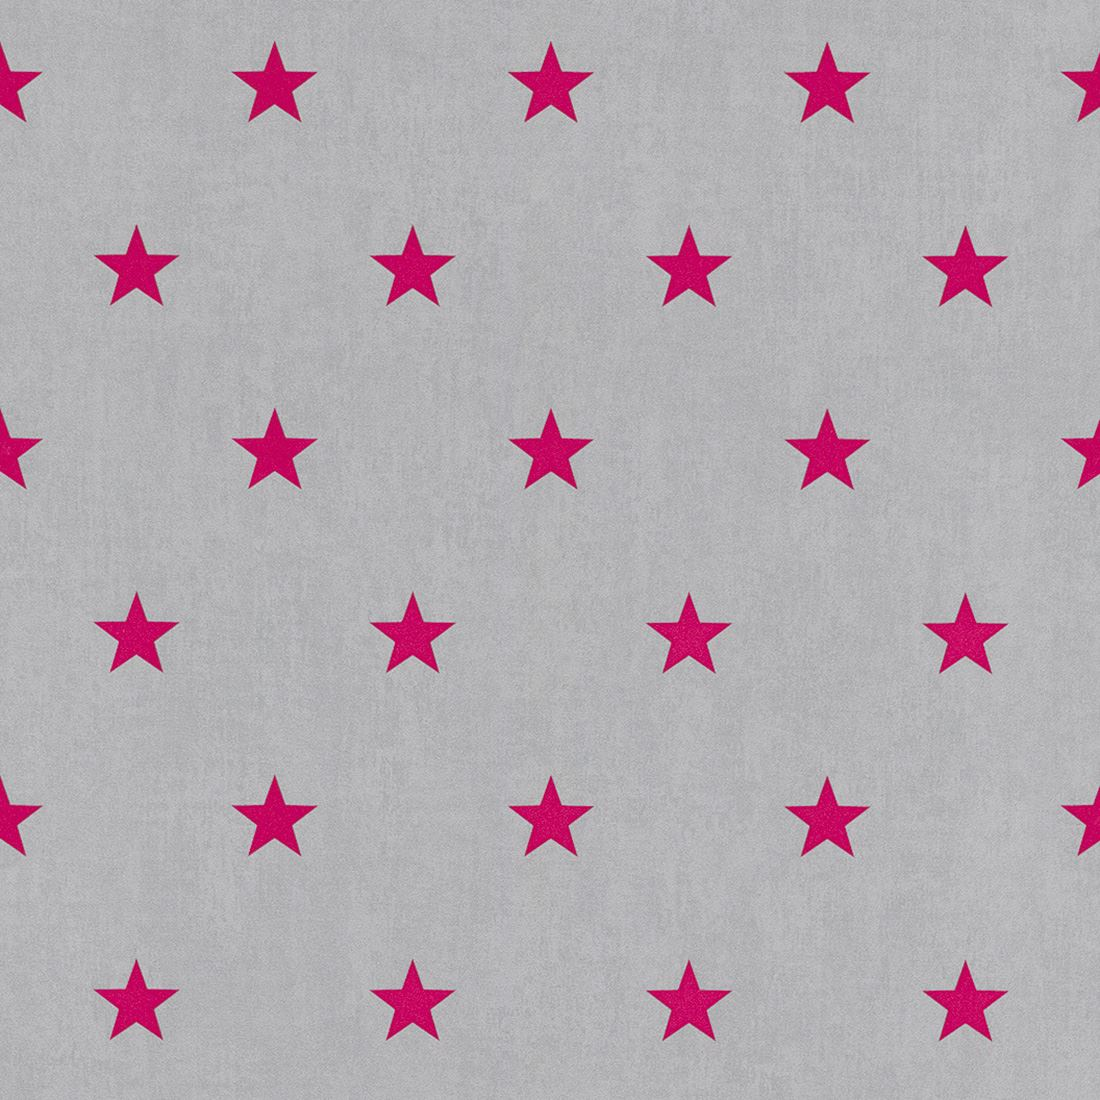 Rasch Sterne Tapete Wand Dekoration Grau Blau Weiss